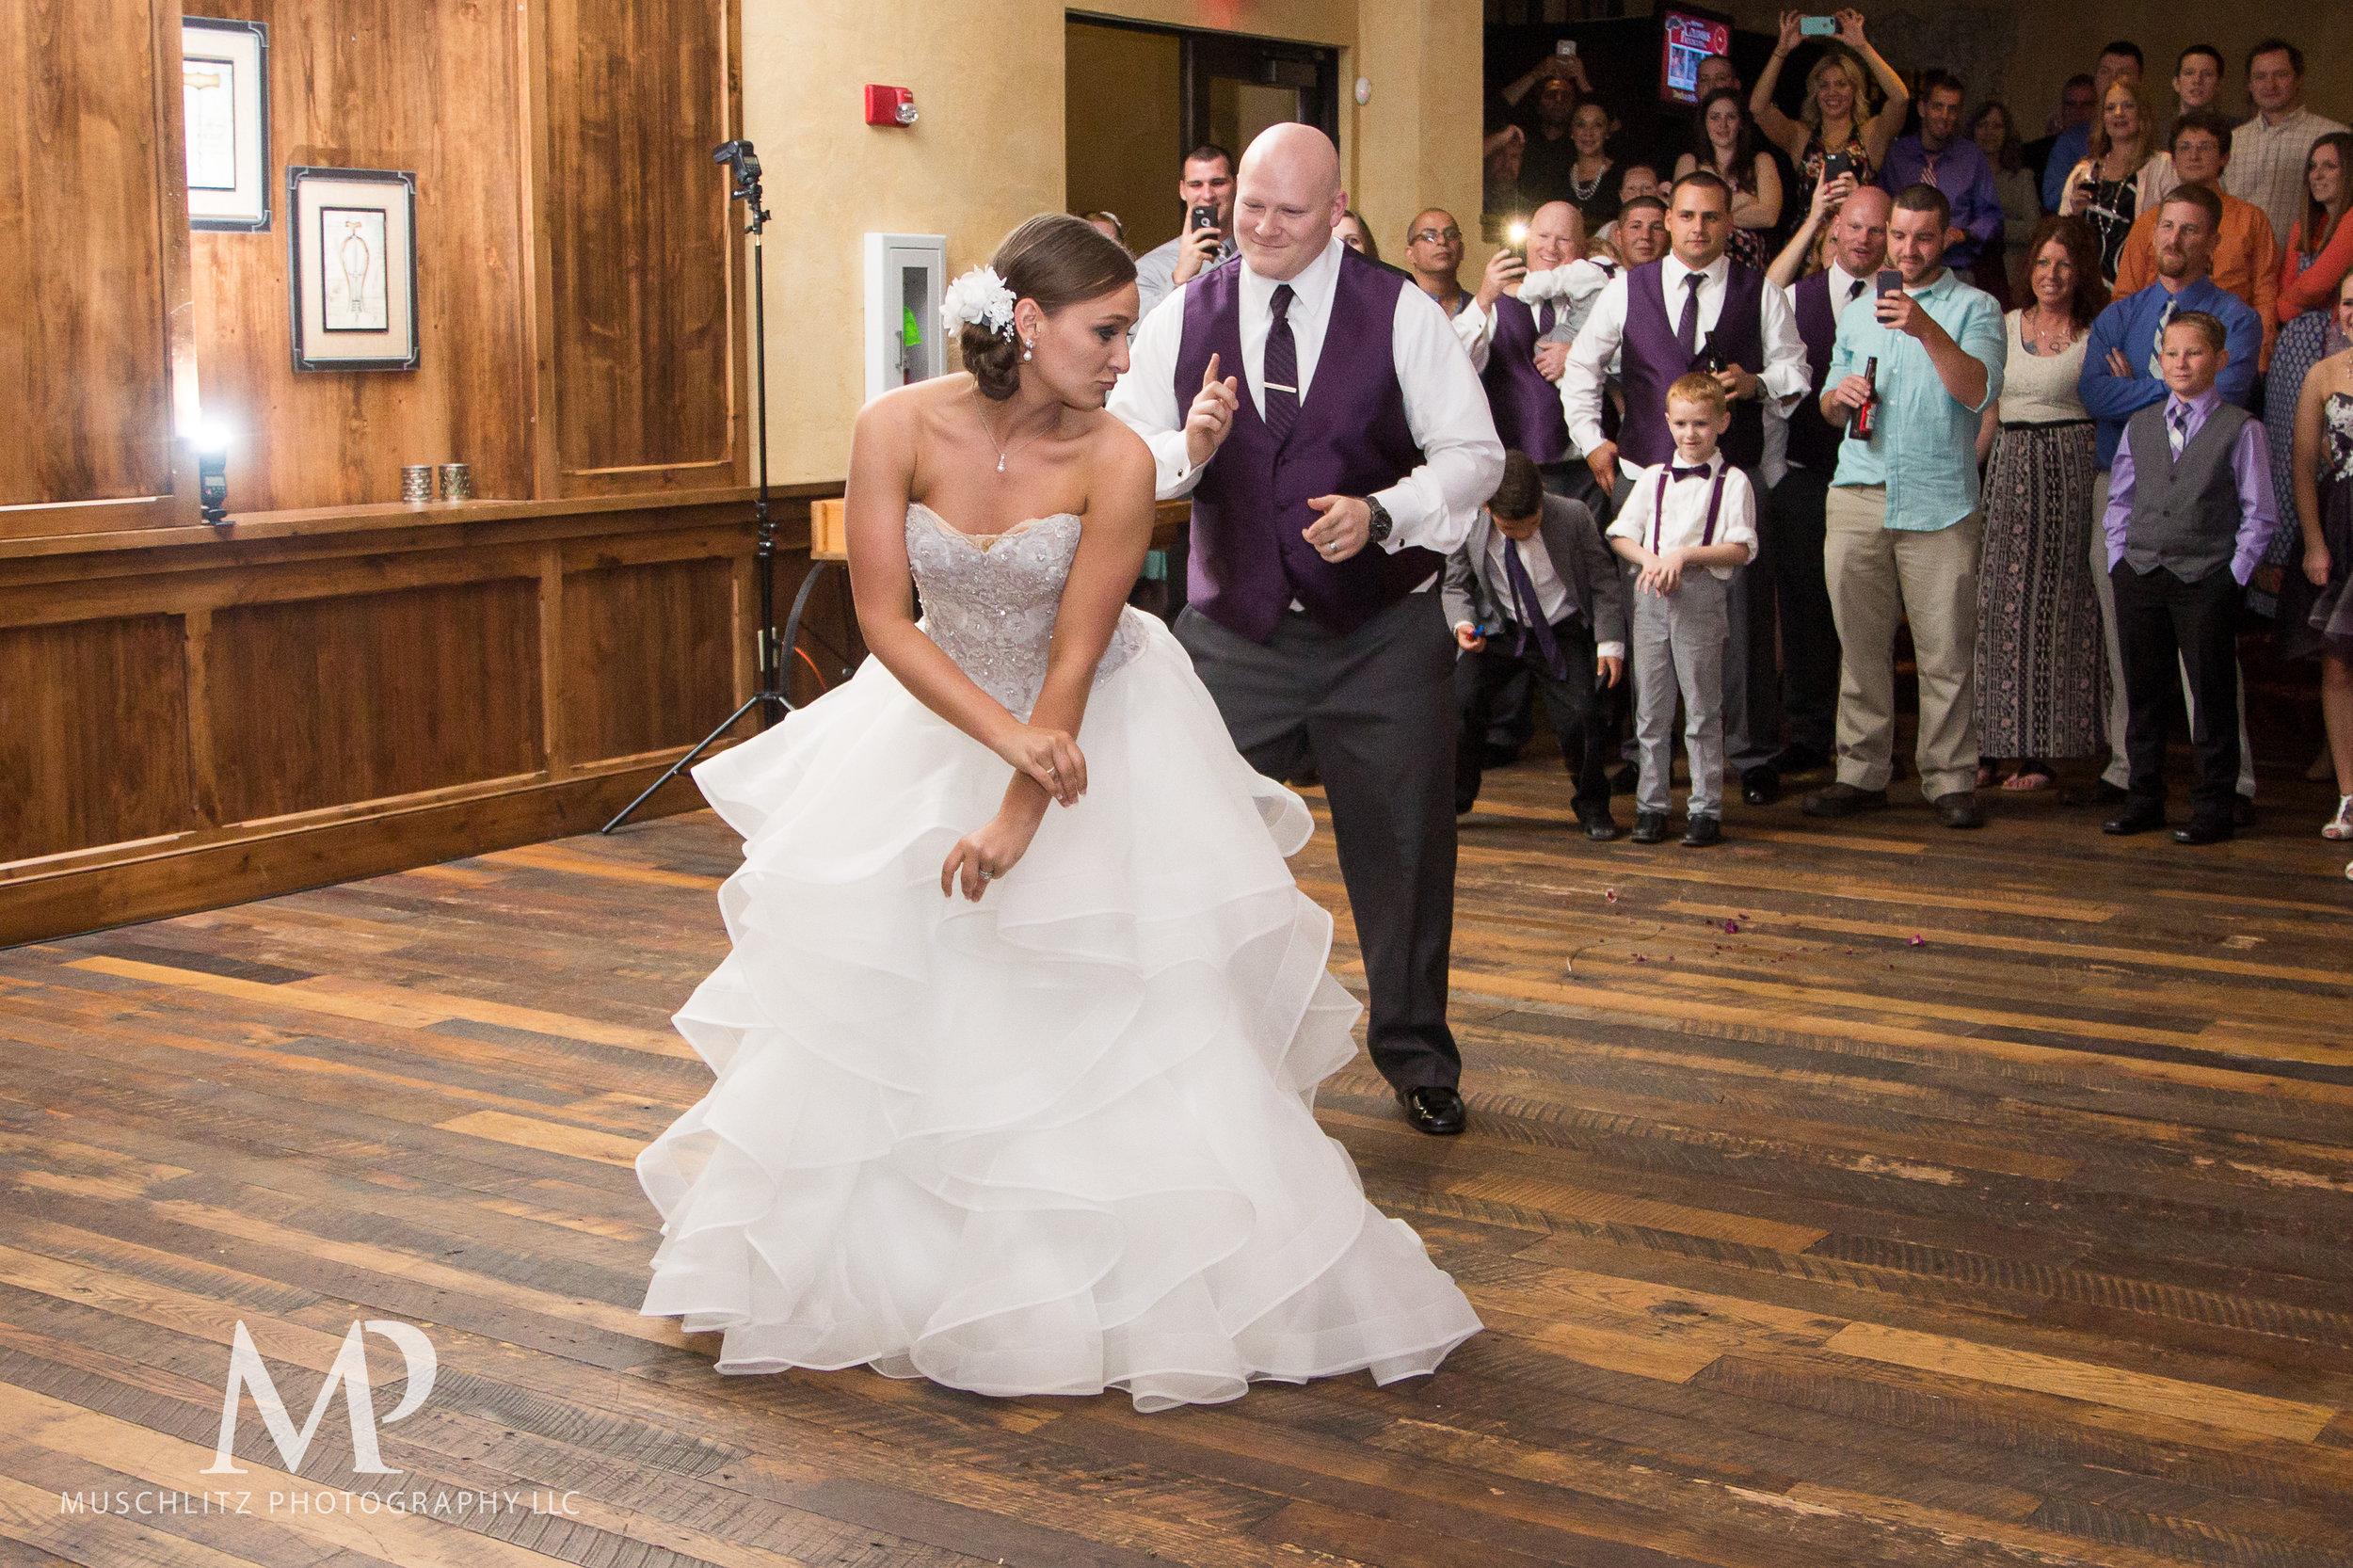 club-at-corazon-wedding-ceremony-reception-columbus-dublin-ohio-ohio-university-theme-083.JPG